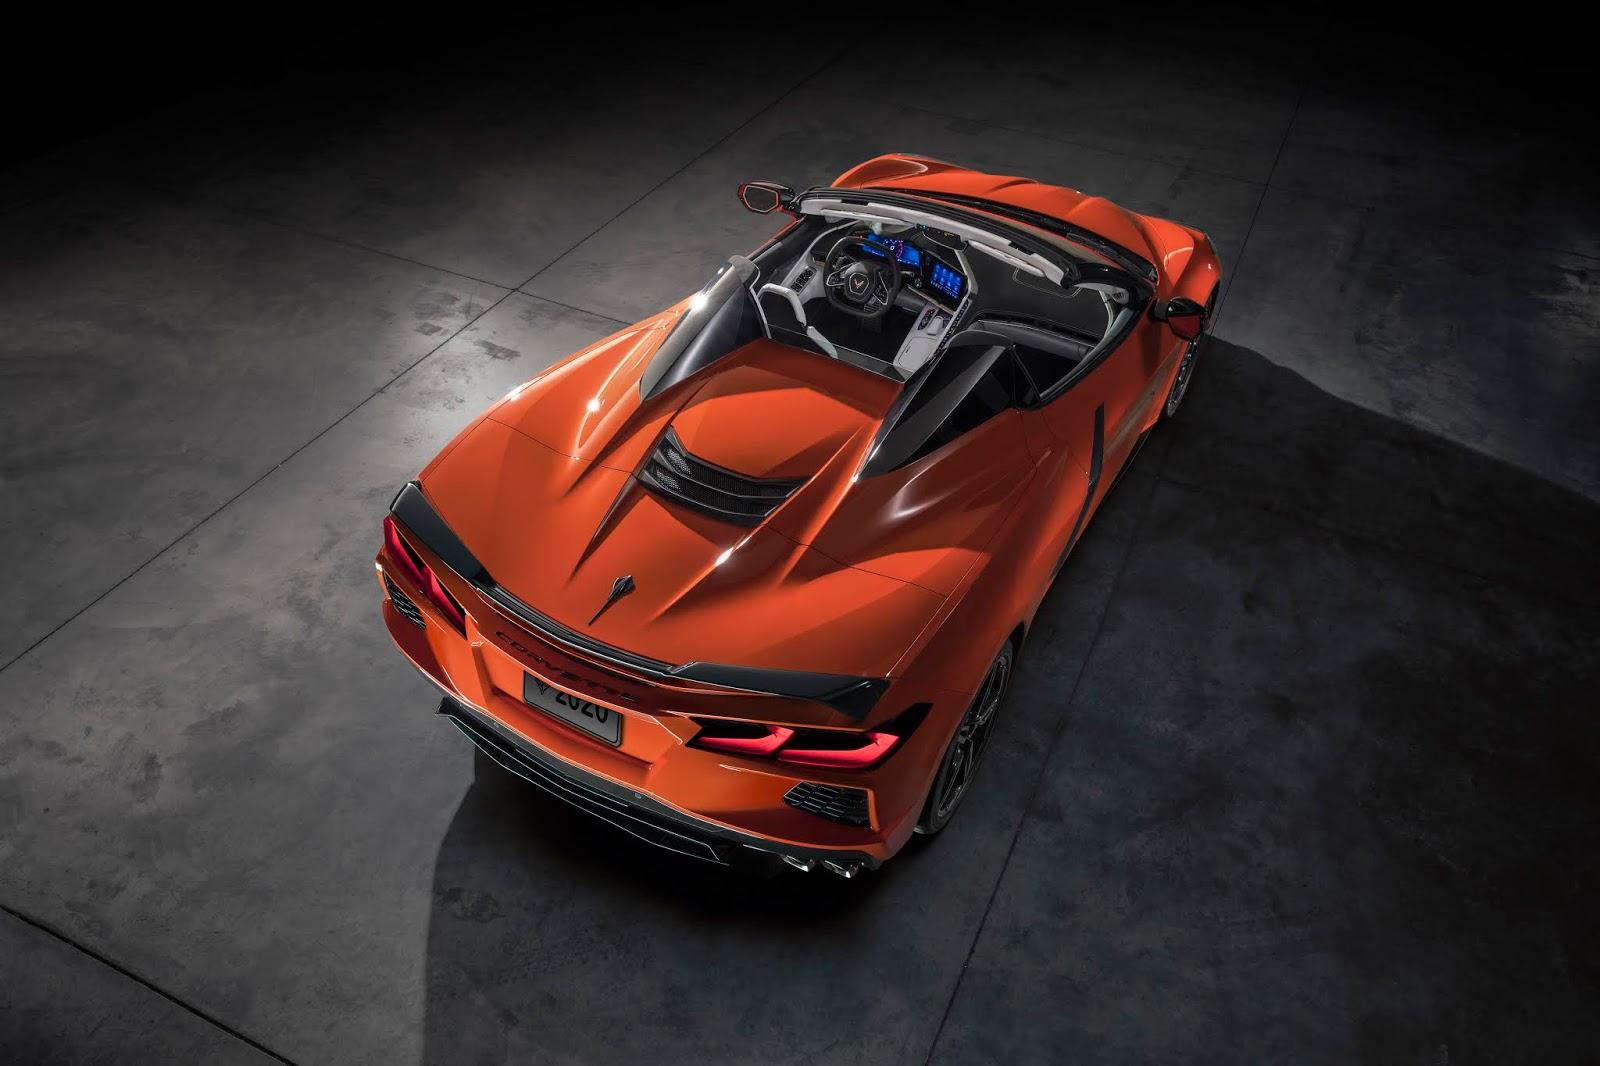 2020 Chevrolet Corvette Stingray Convertible 001 Γιατί η C8 Convertible είναι η καλύτερη Corvette ever C8, Chevrolet, Chevrolet Corvette, Corvette, zblog, ειδήσεις, καινούργιο, καινούρια, καινούριο